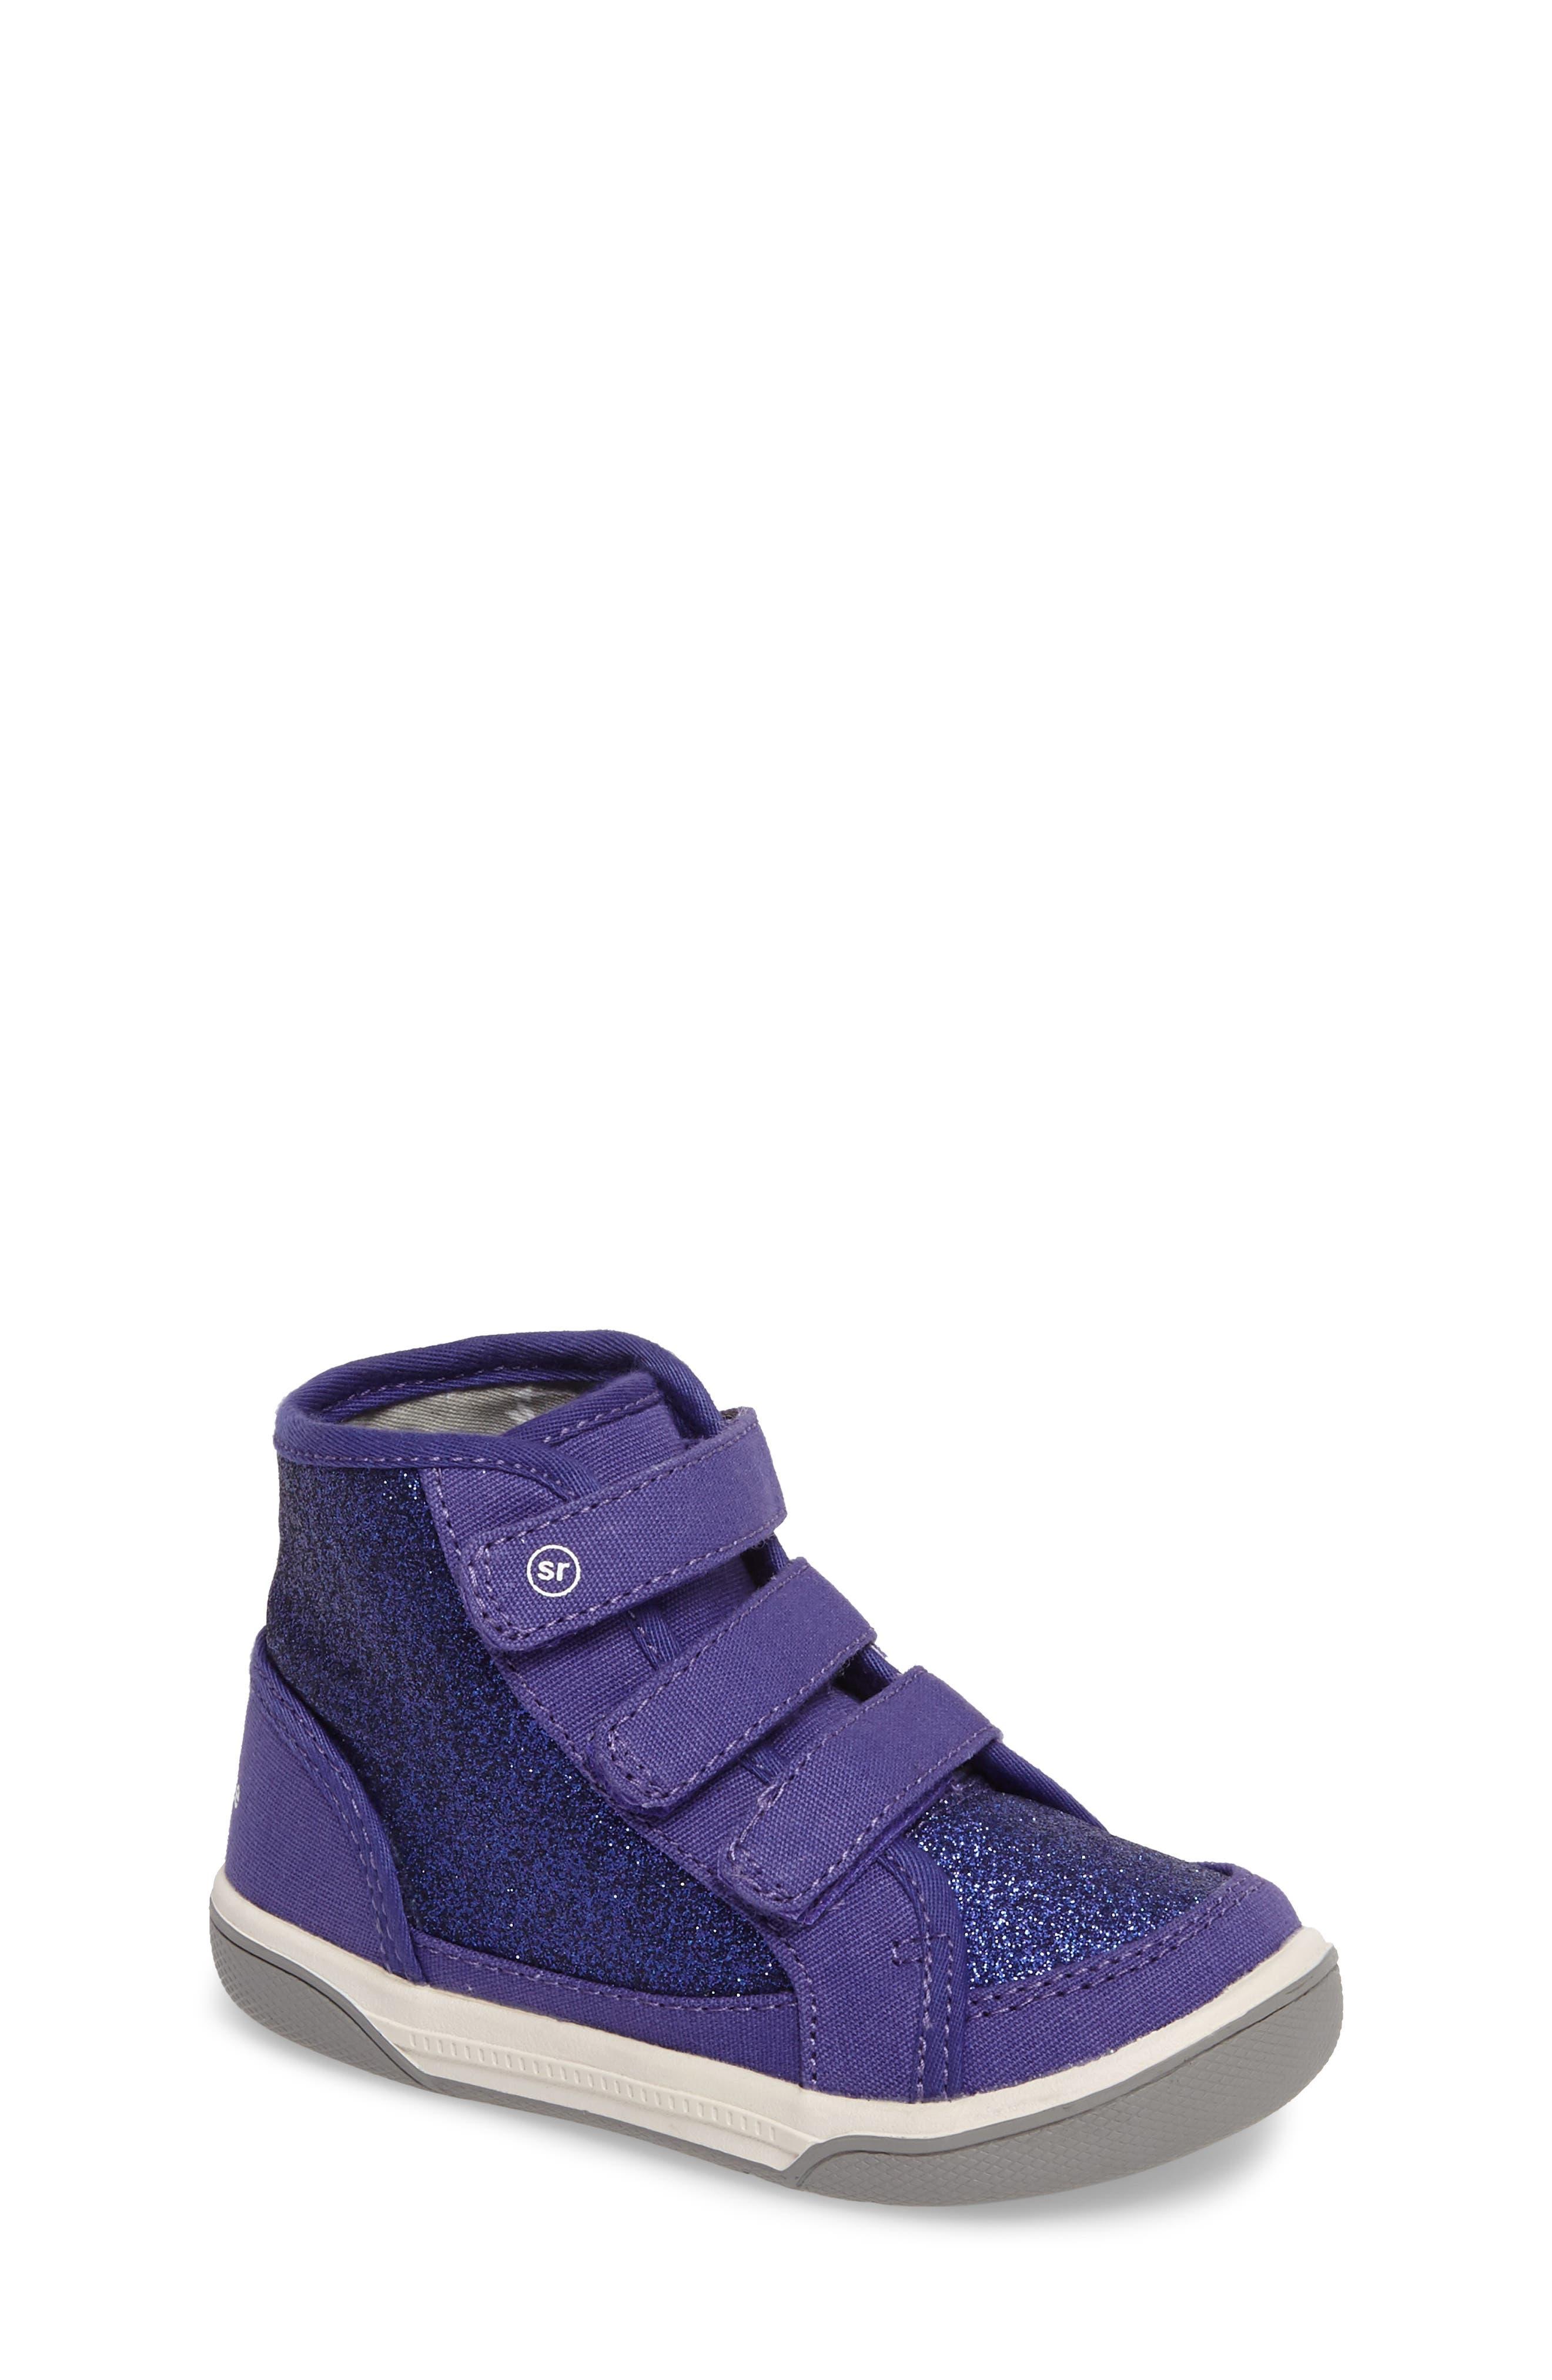 Ellis Glitter High Top Sneaker,                             Main thumbnail 1, color,                             500